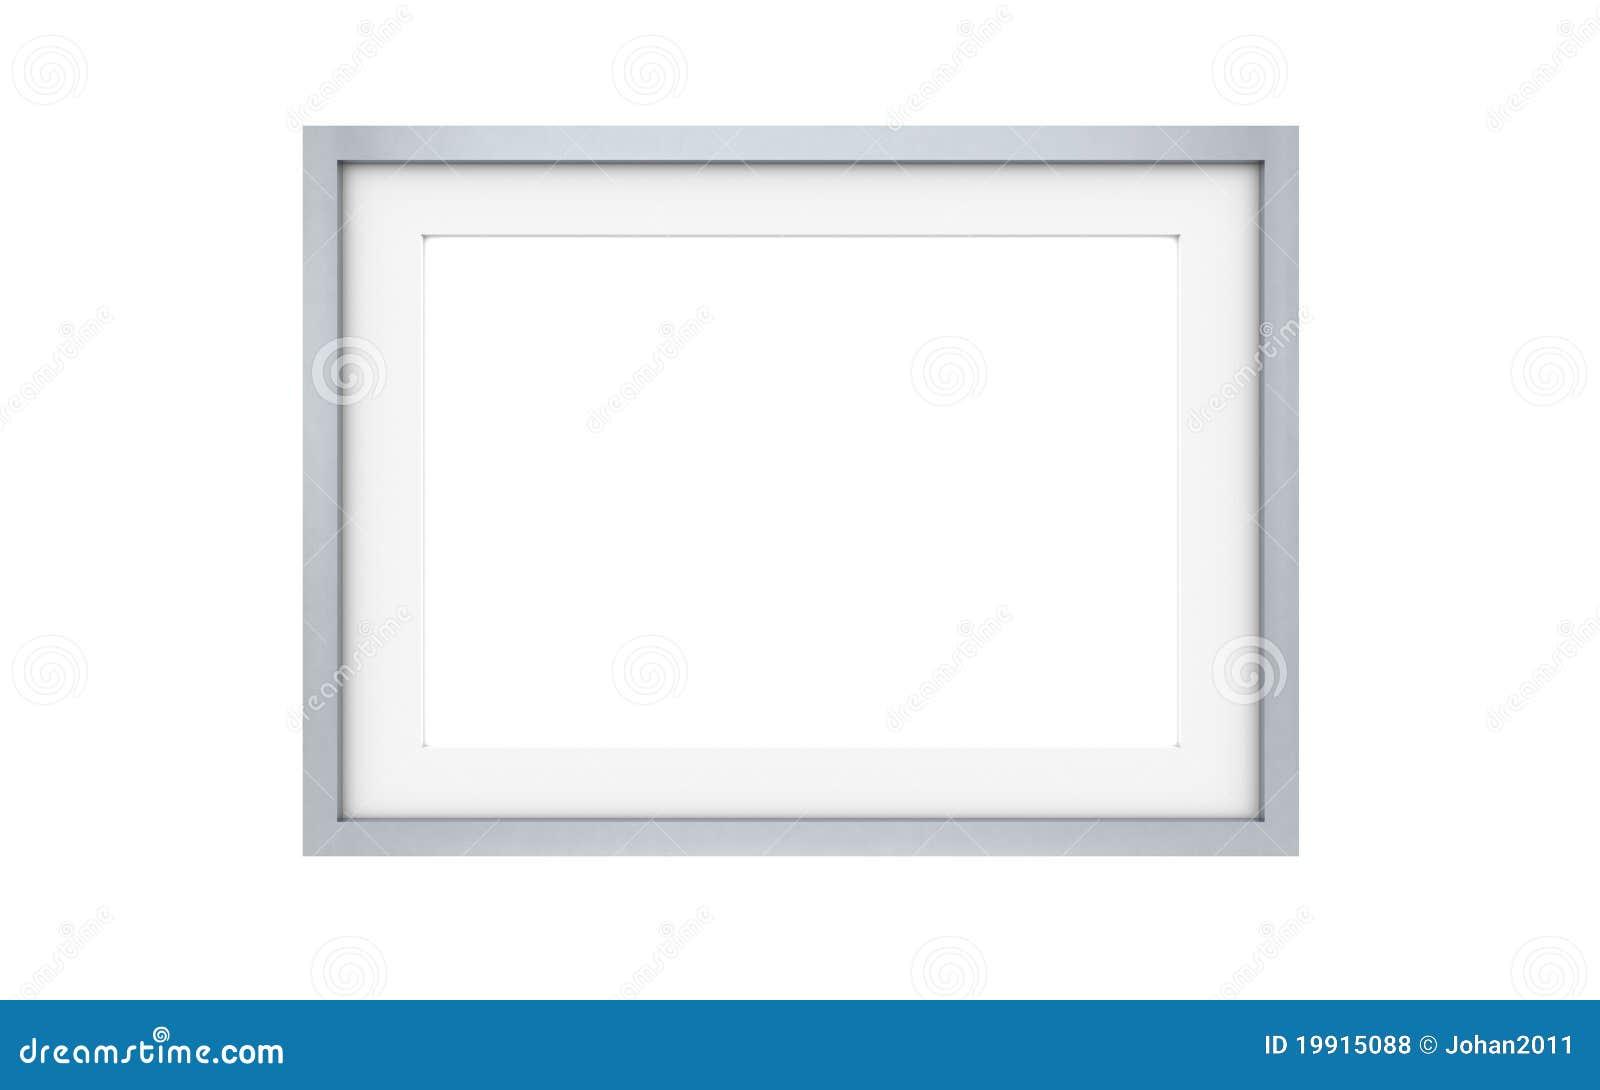 Cadre de tableau acier photos libres de droits image - Image de cadre de tableau ...